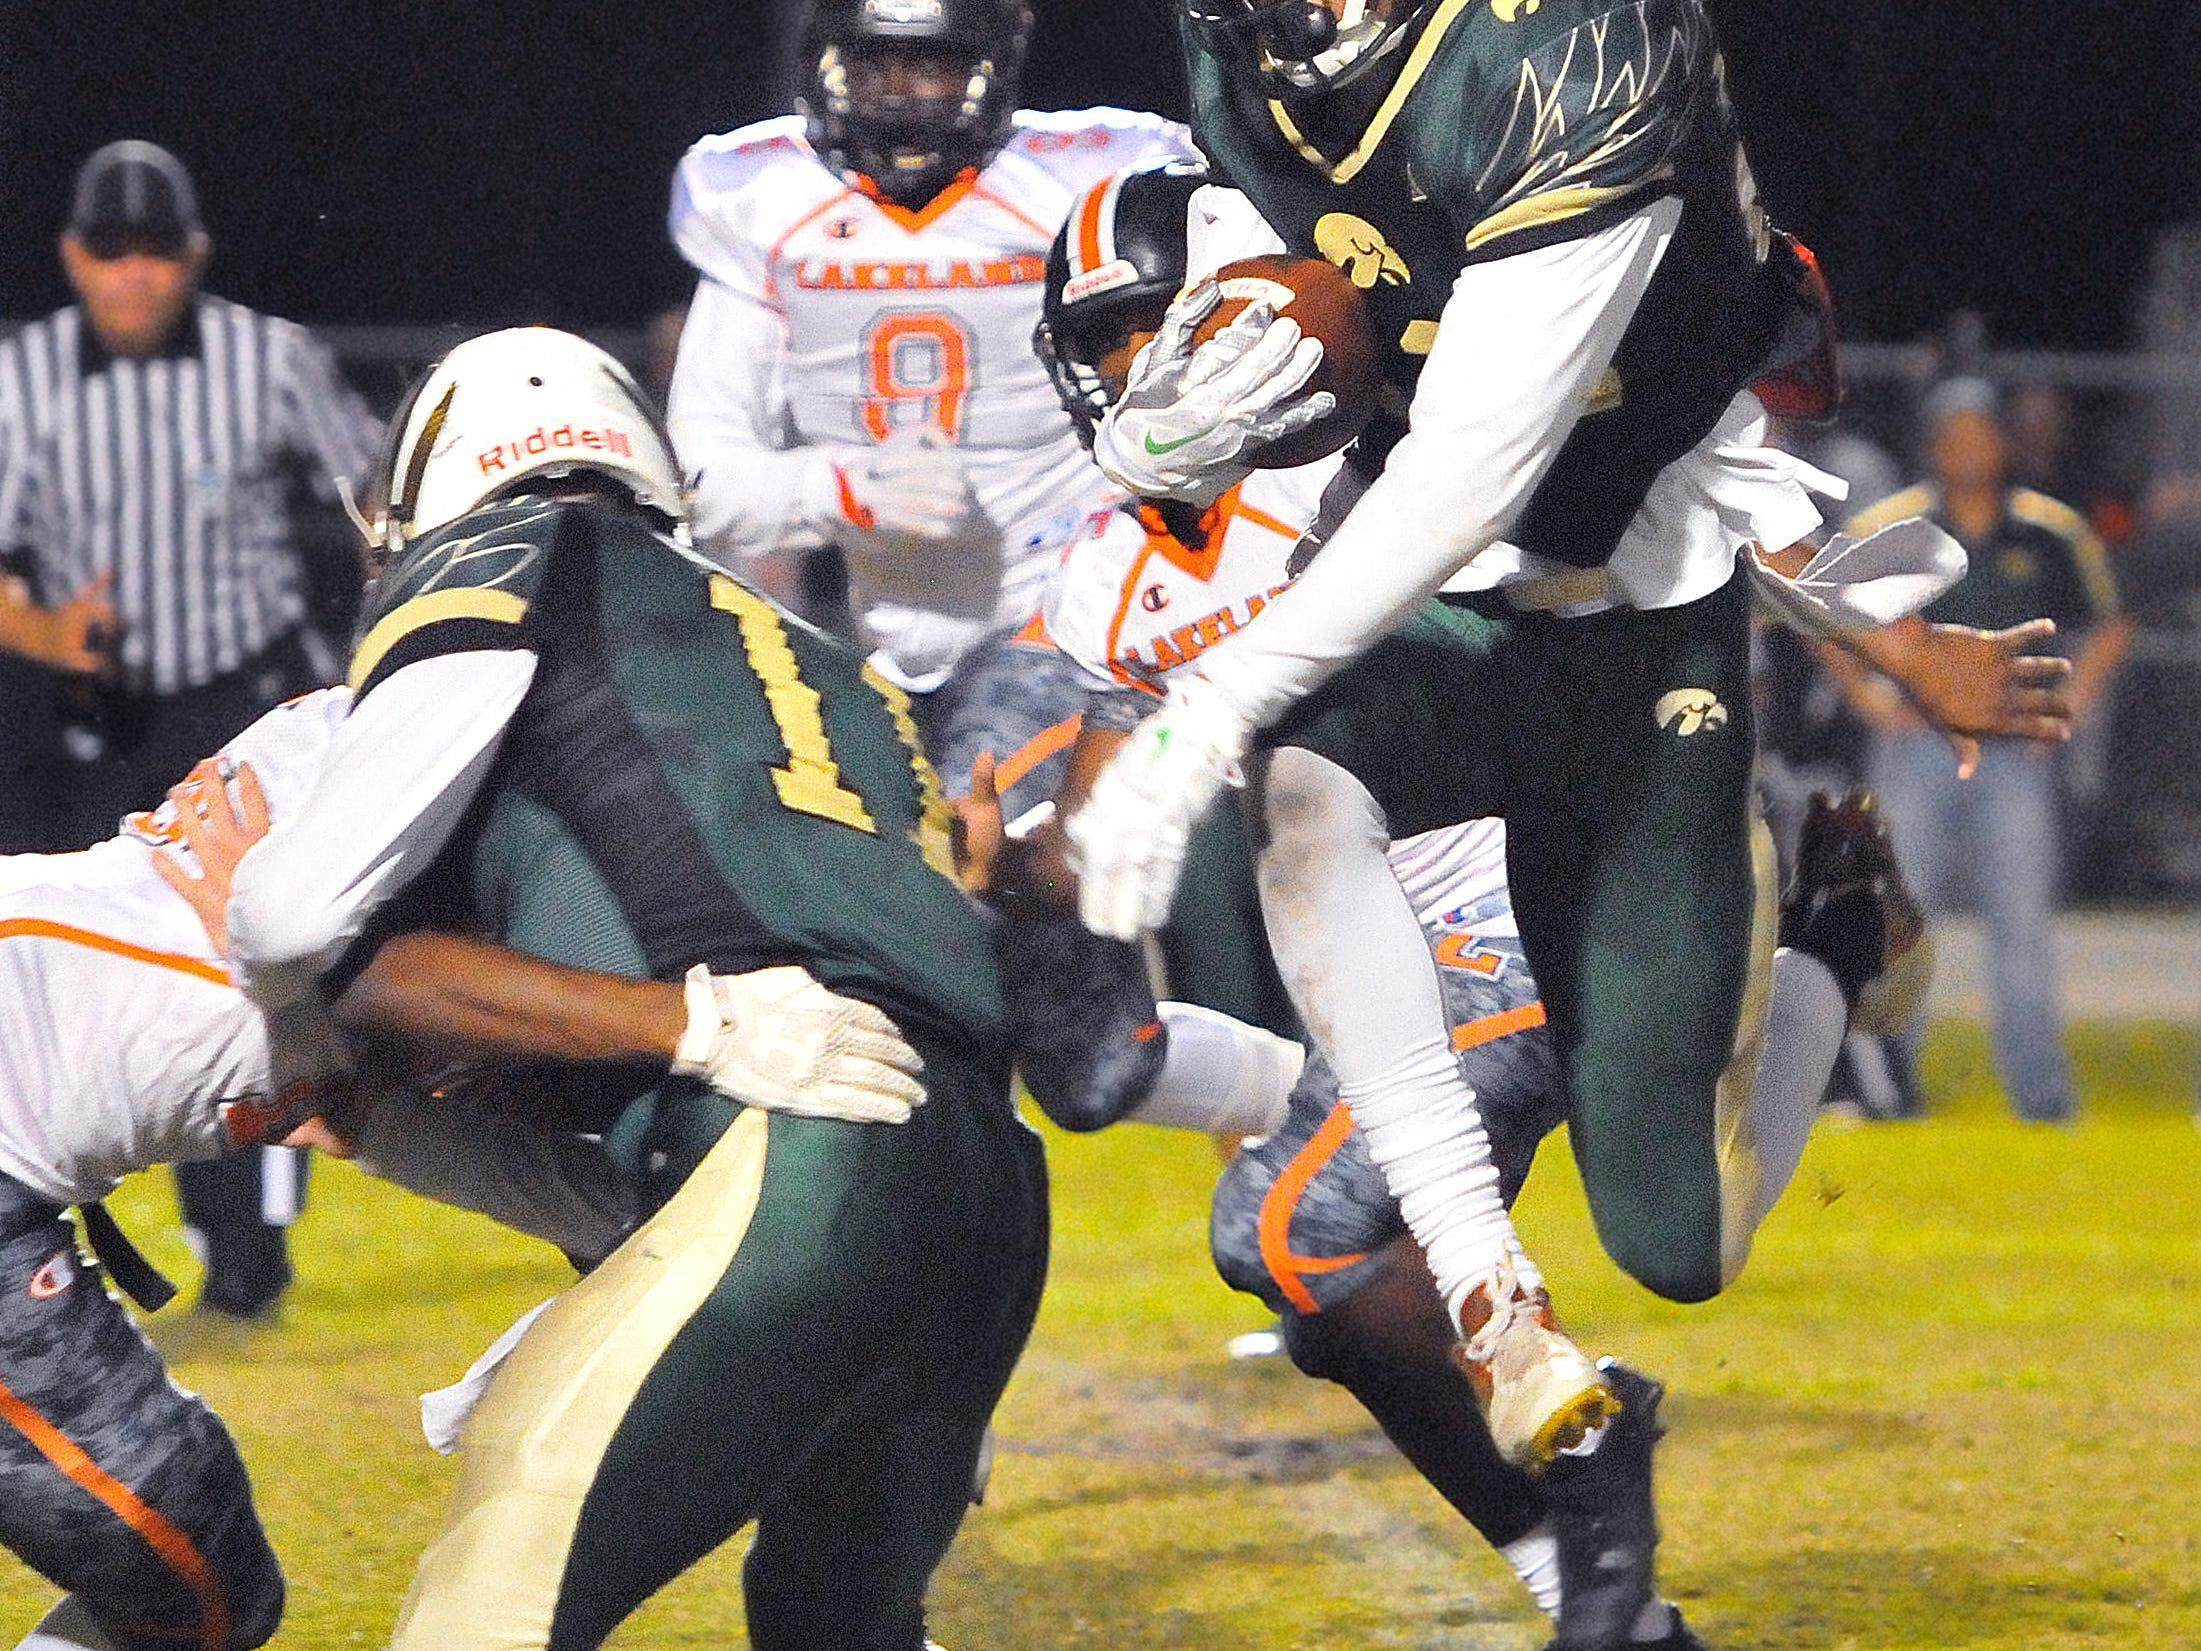 Viera High's#23 Alex Cabrera hurdles Lakeland High defenders on his way for a Viera High touchdown during Friday nights regional finals held at Viera High School stadium.